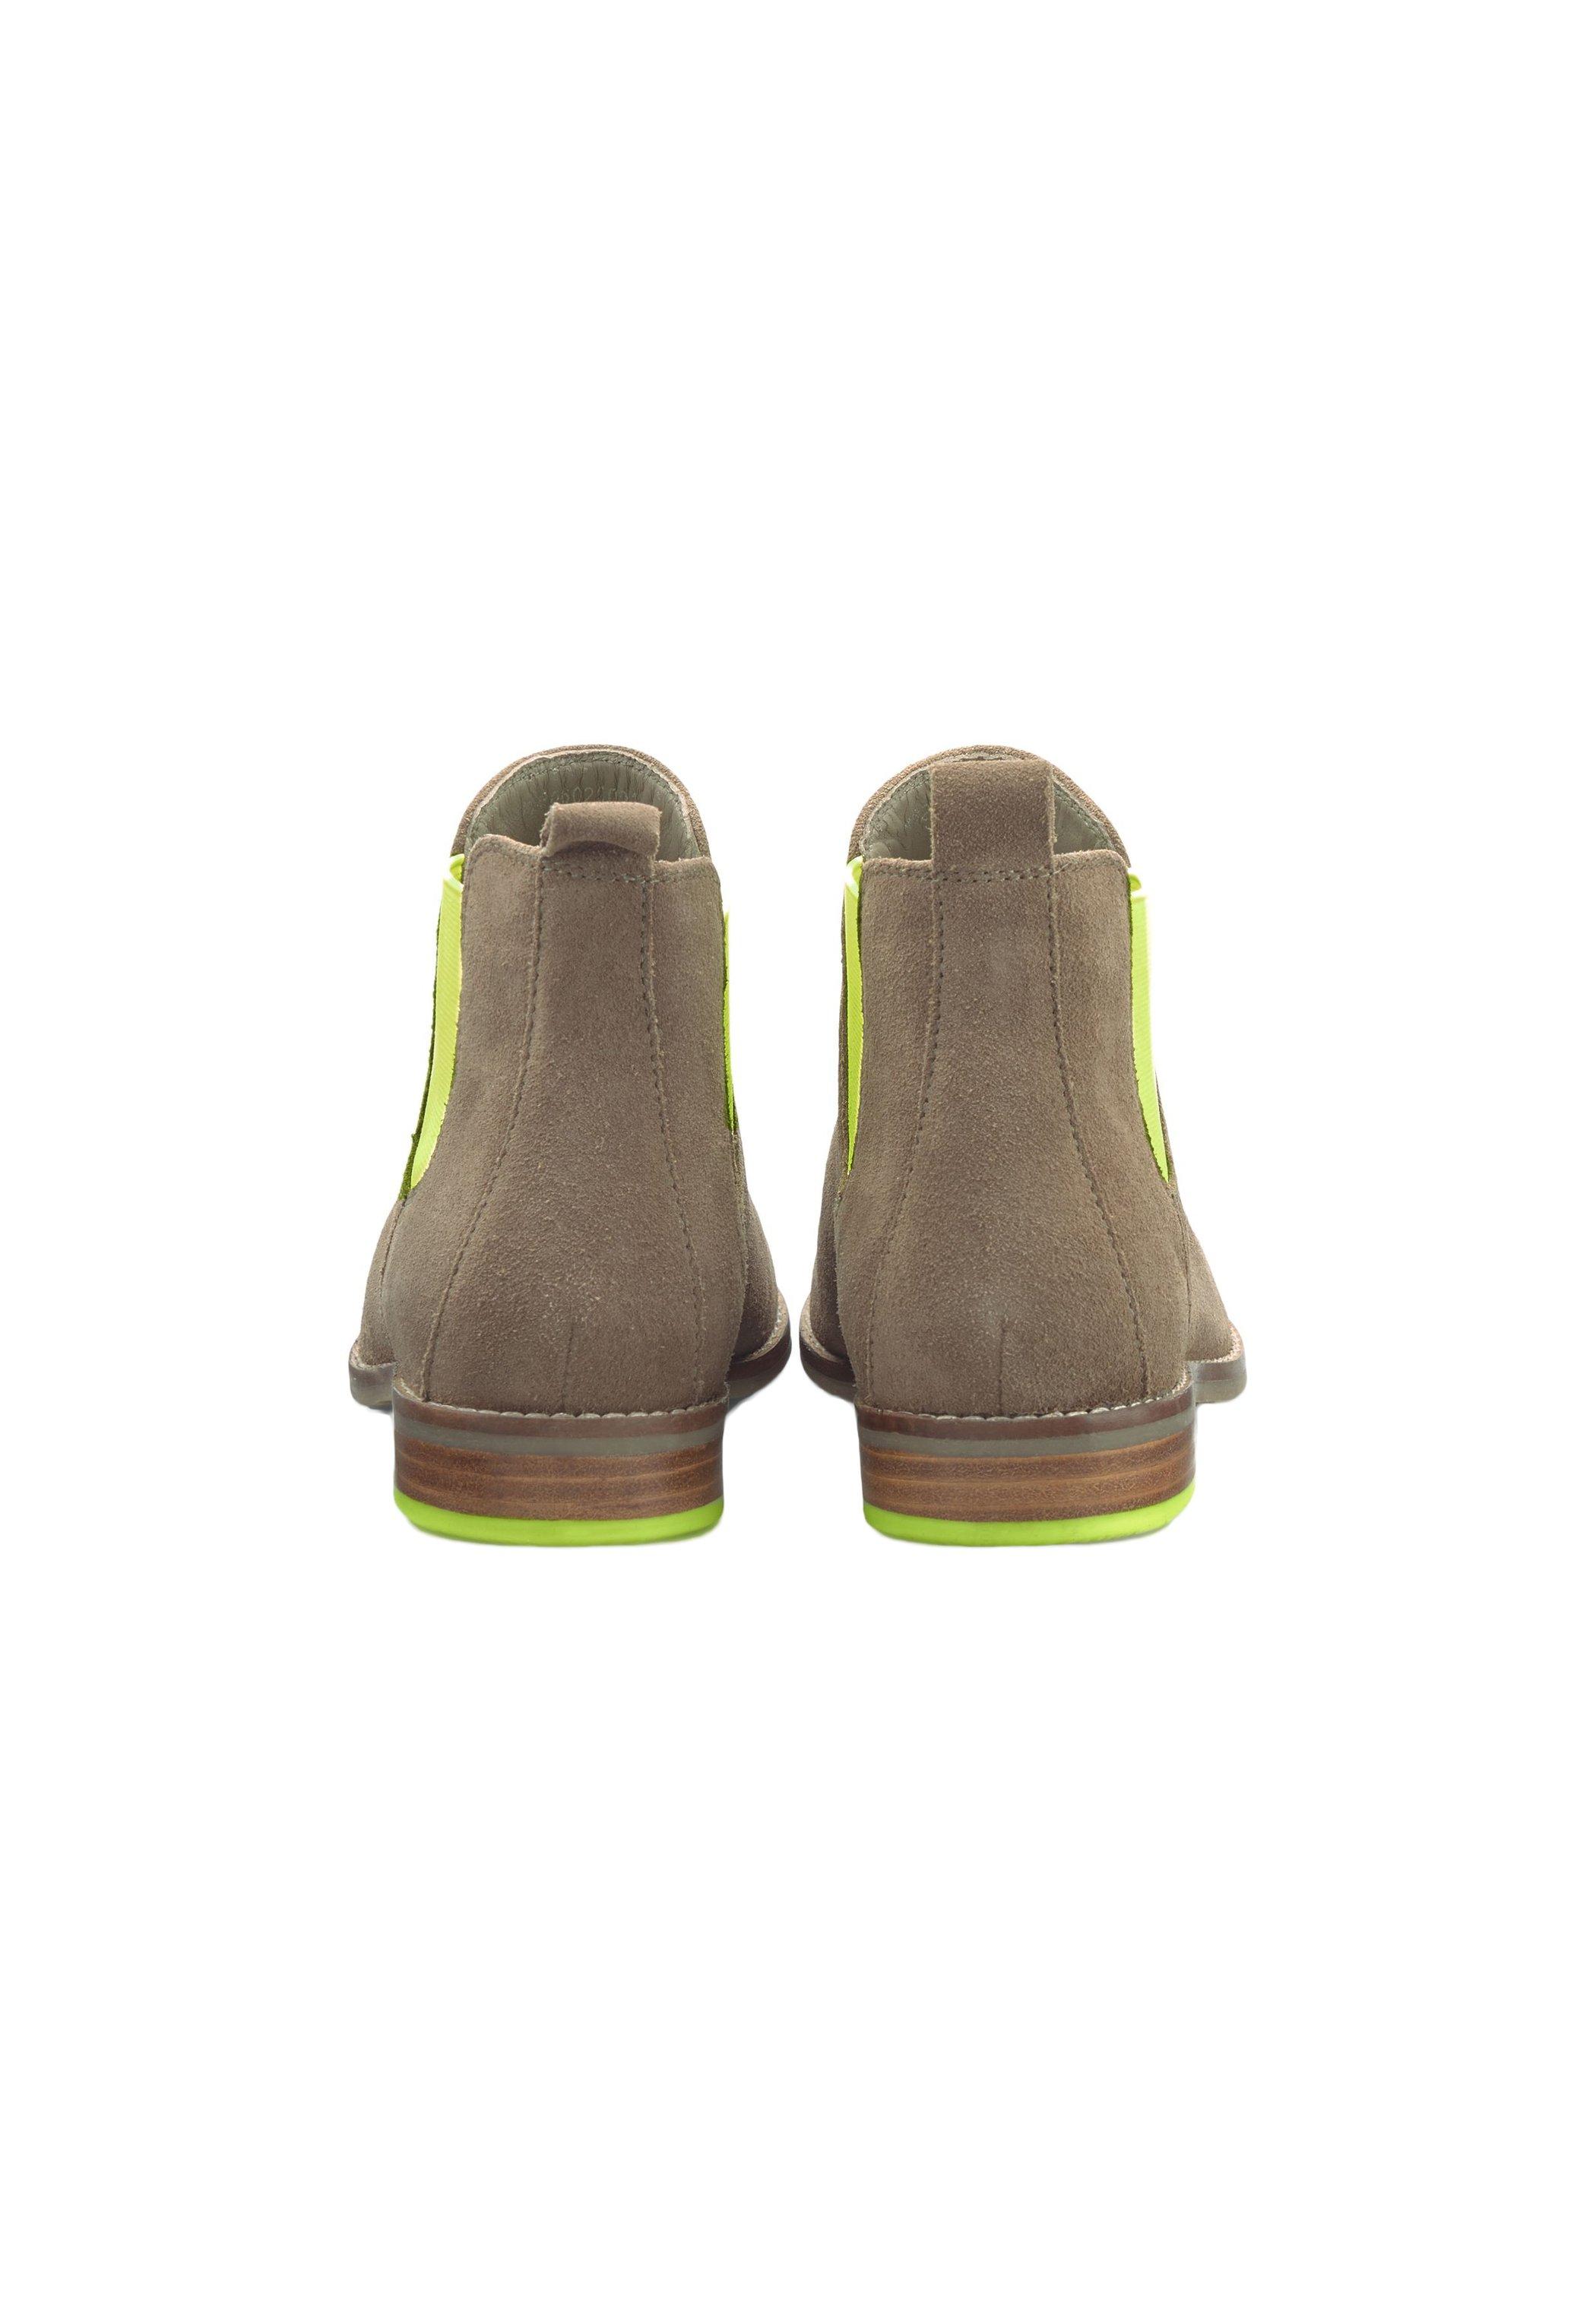 COX Stiefelette - taupe | Damen Schuhe 2020